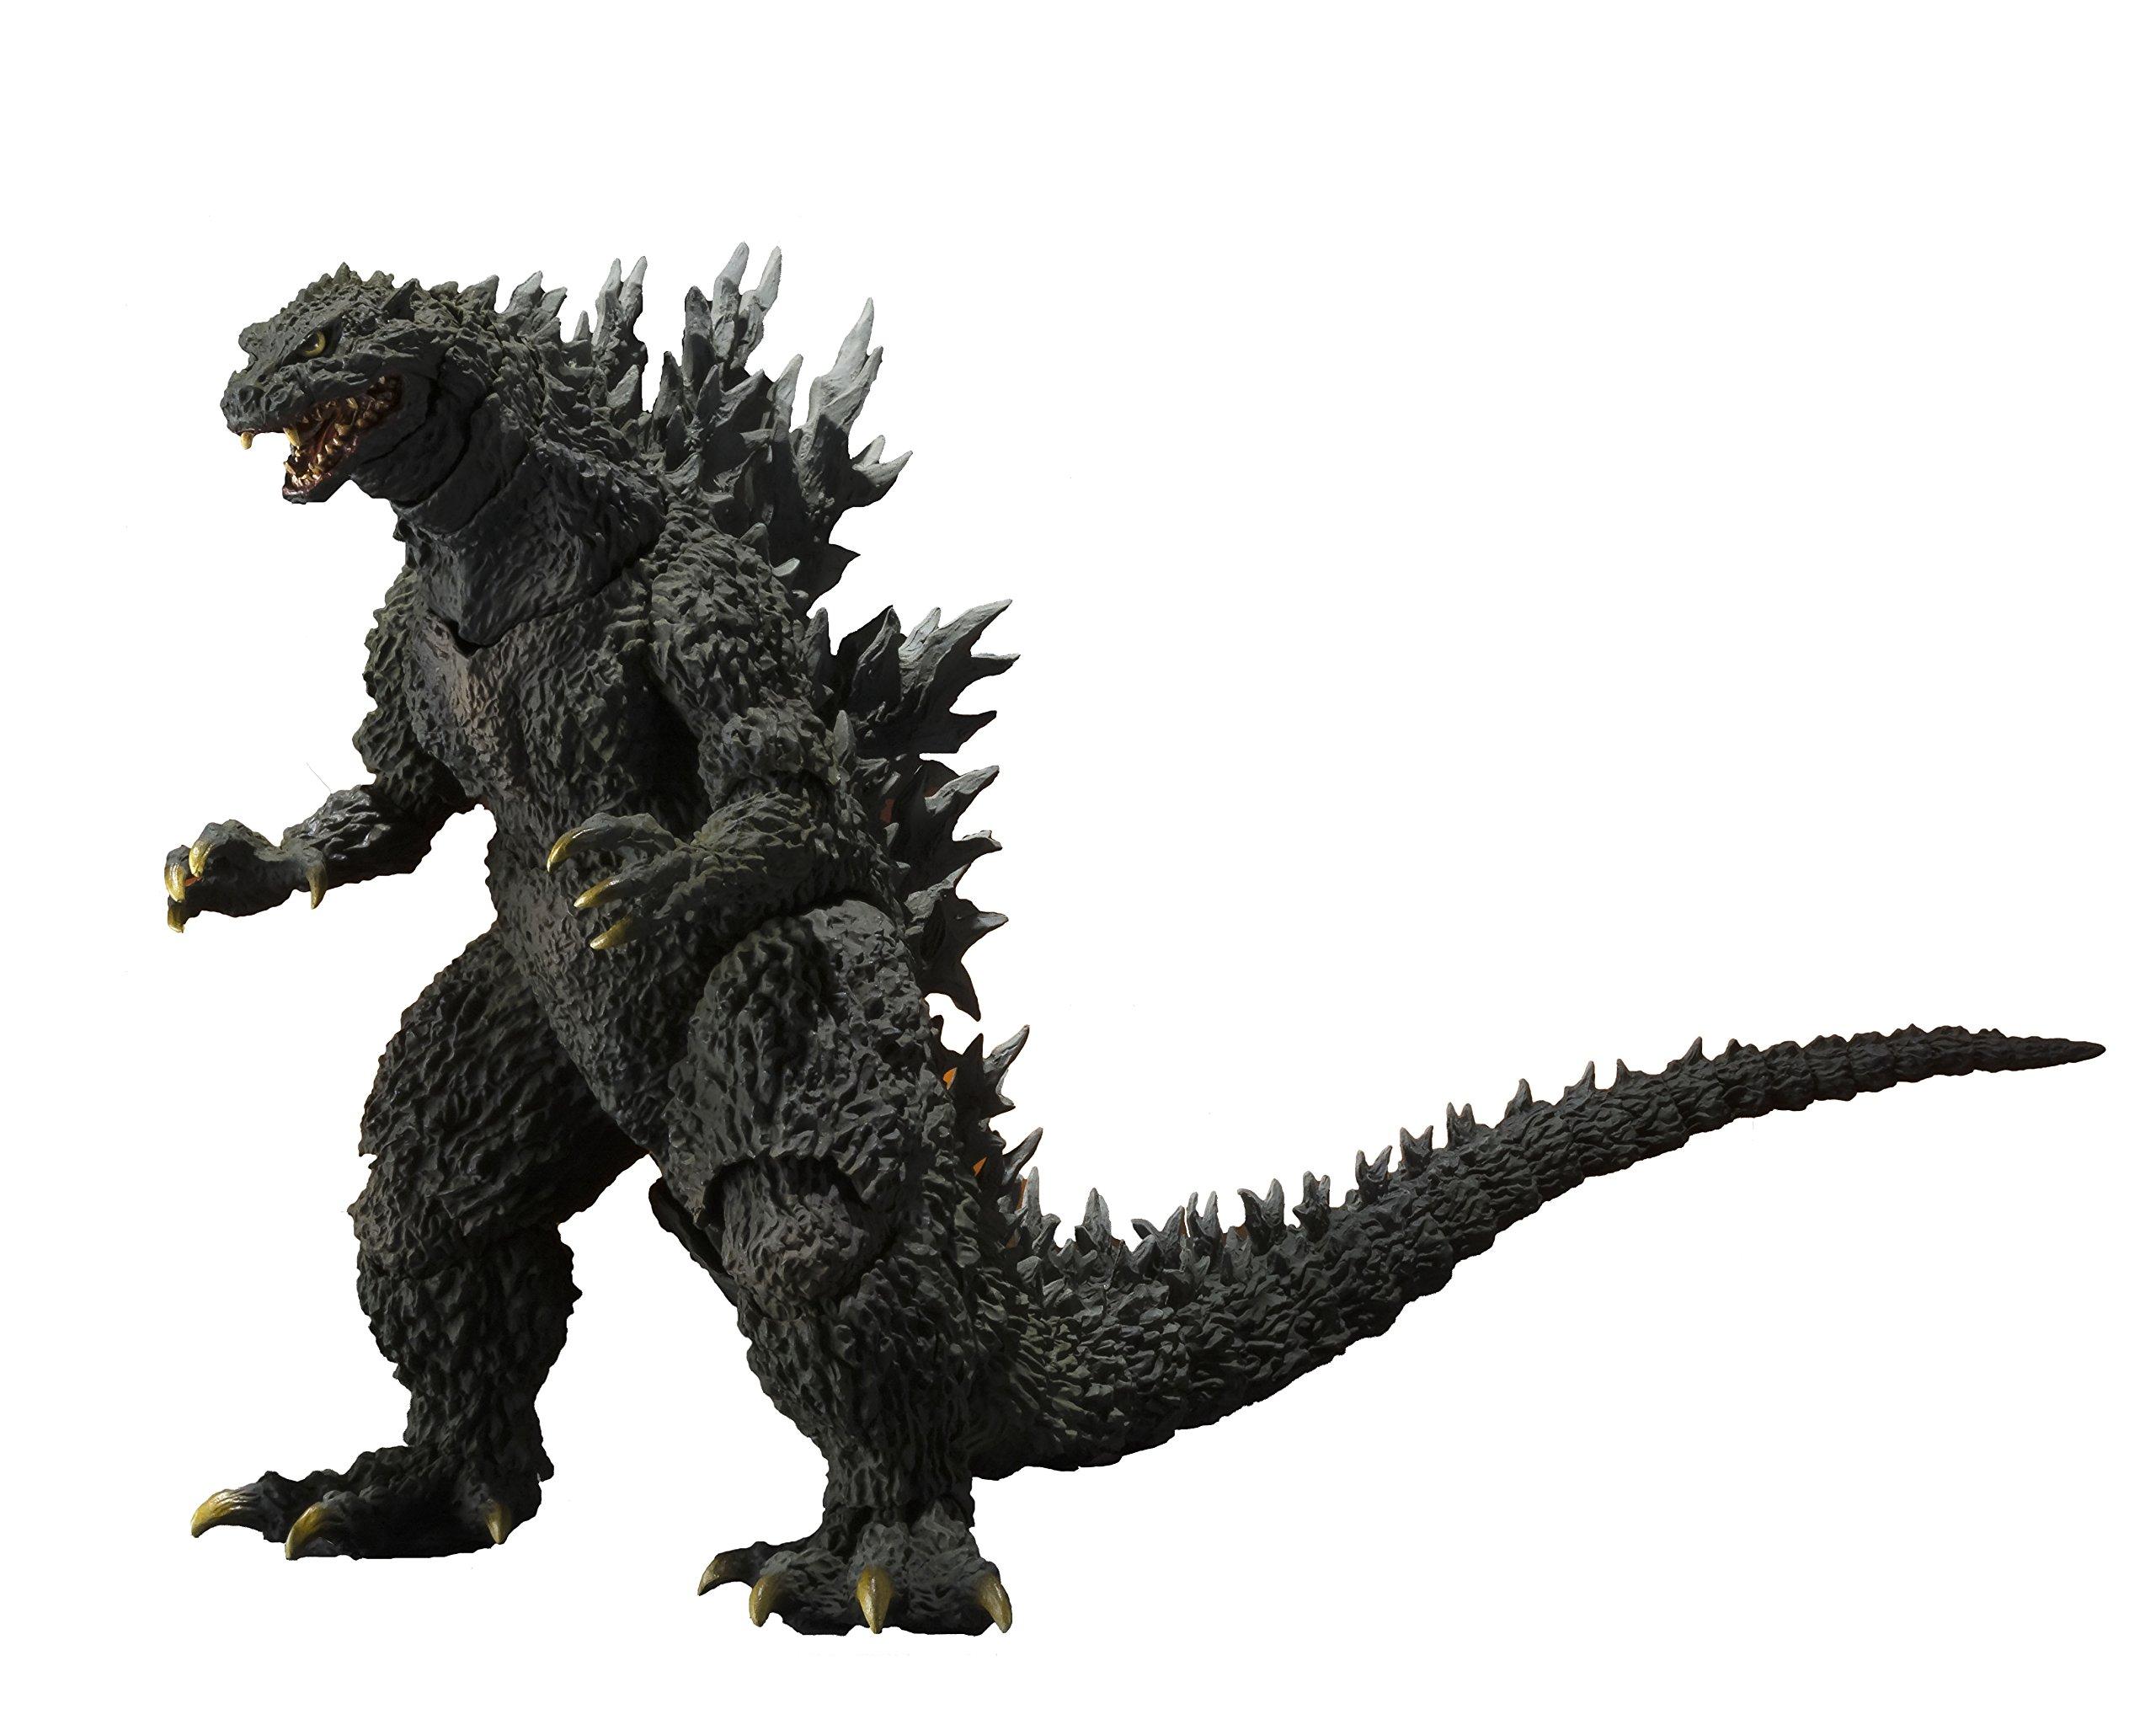 Bandai Tamashii Nations MonsterArts Godzilla 2000 Millennium Special Color Version S.H. Figuarts Action Figure